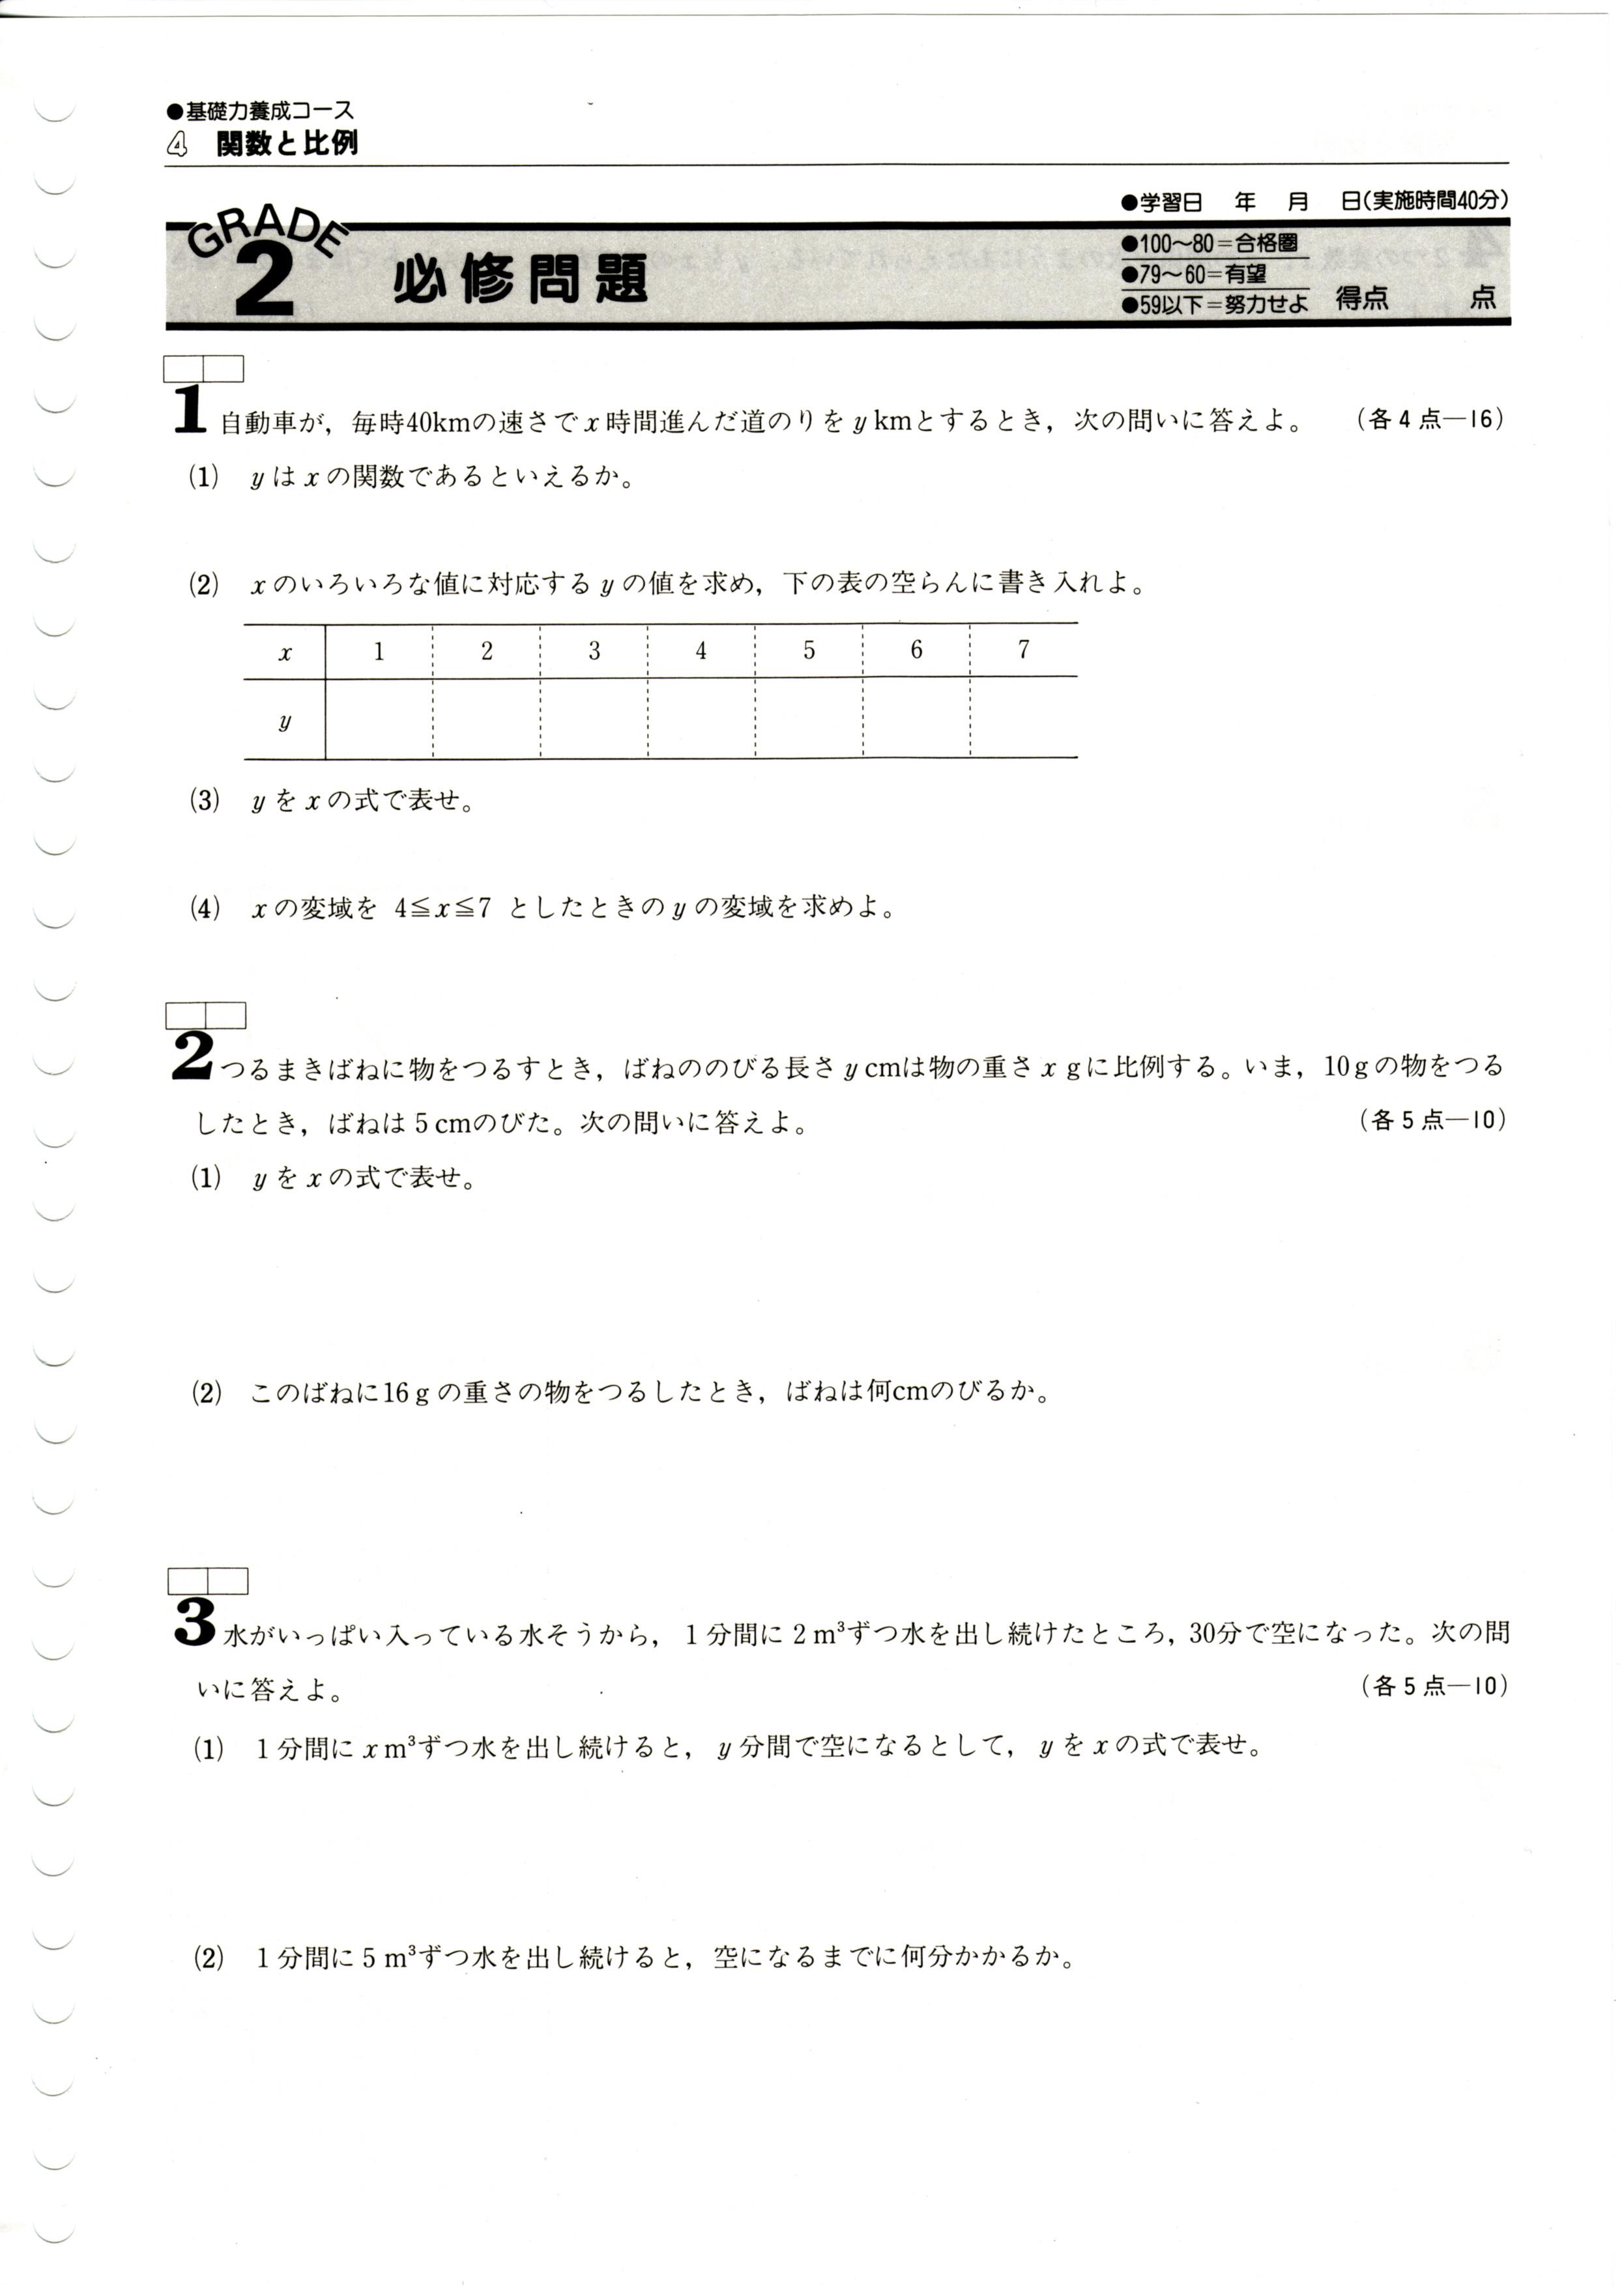 高校受験教材 グレード2 必修問題 数学